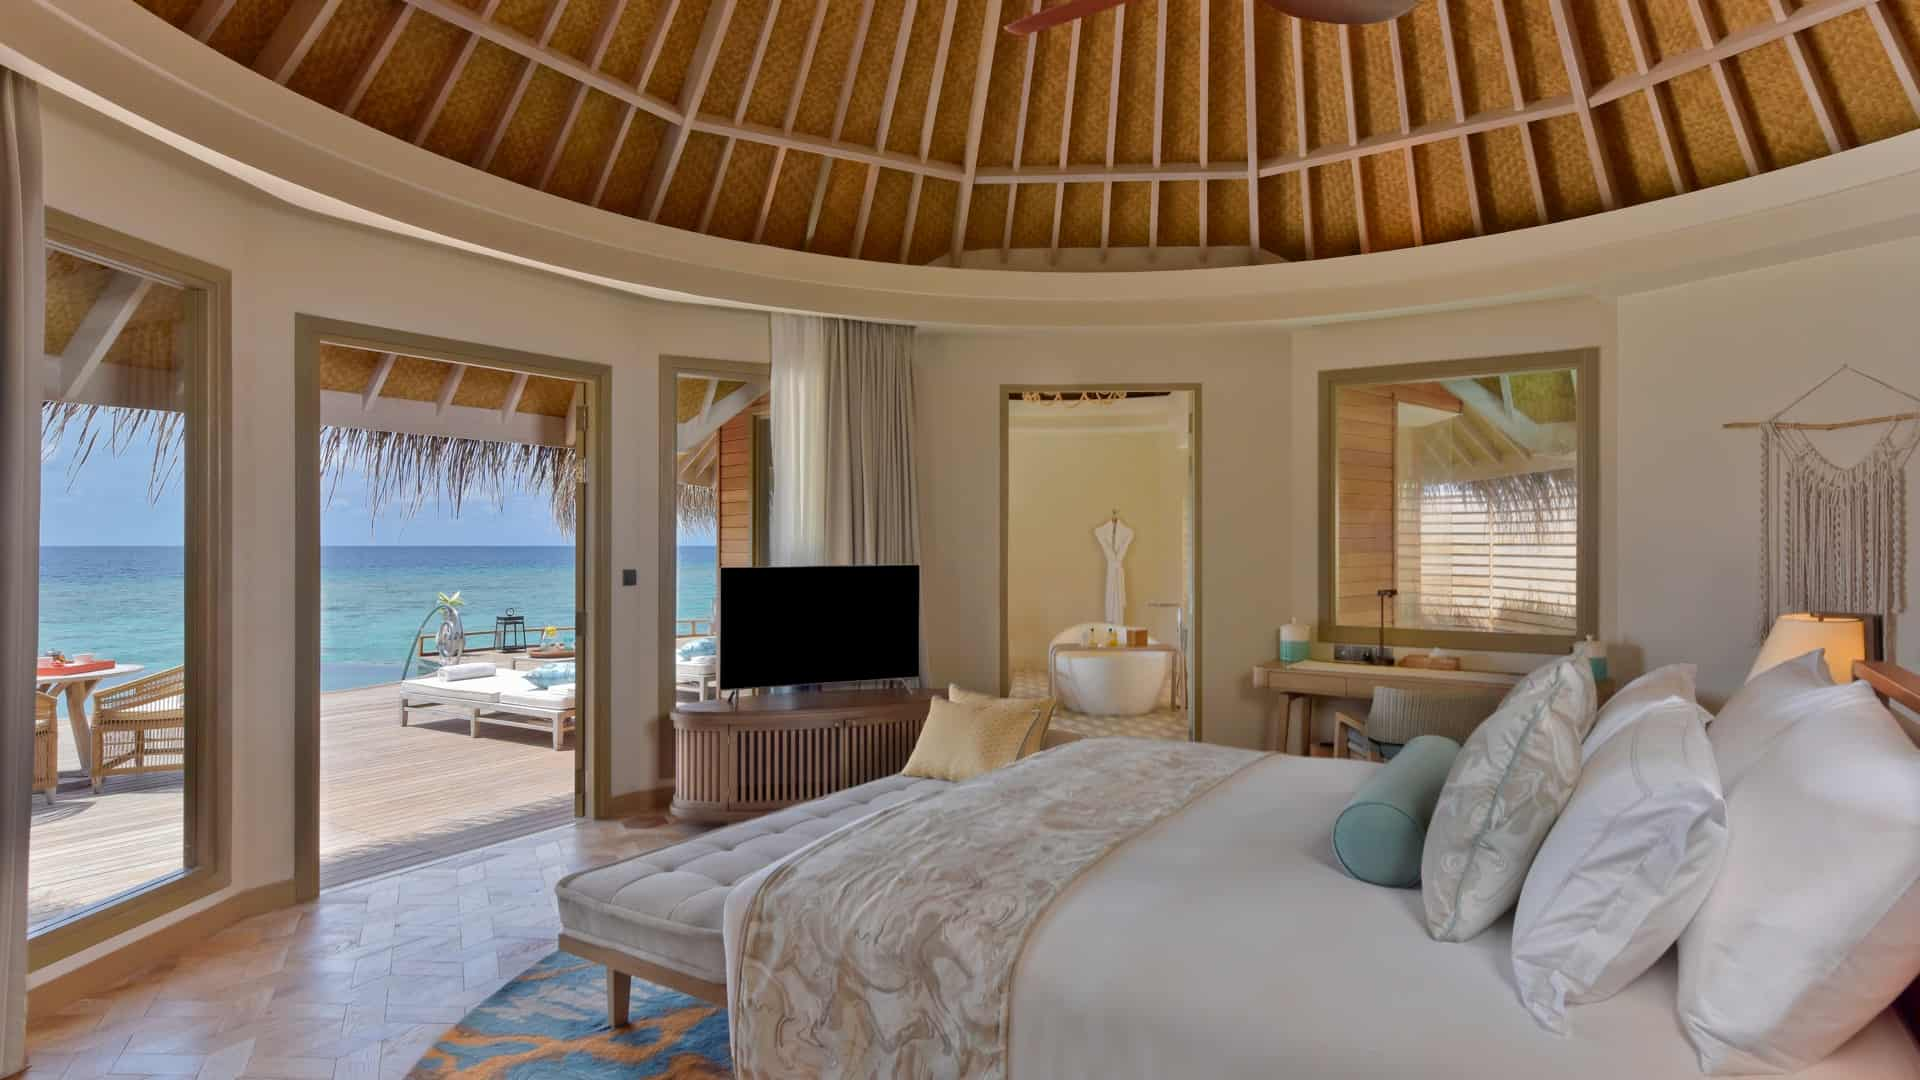 Resort Maldive The Nautilus Maldives Ocean house